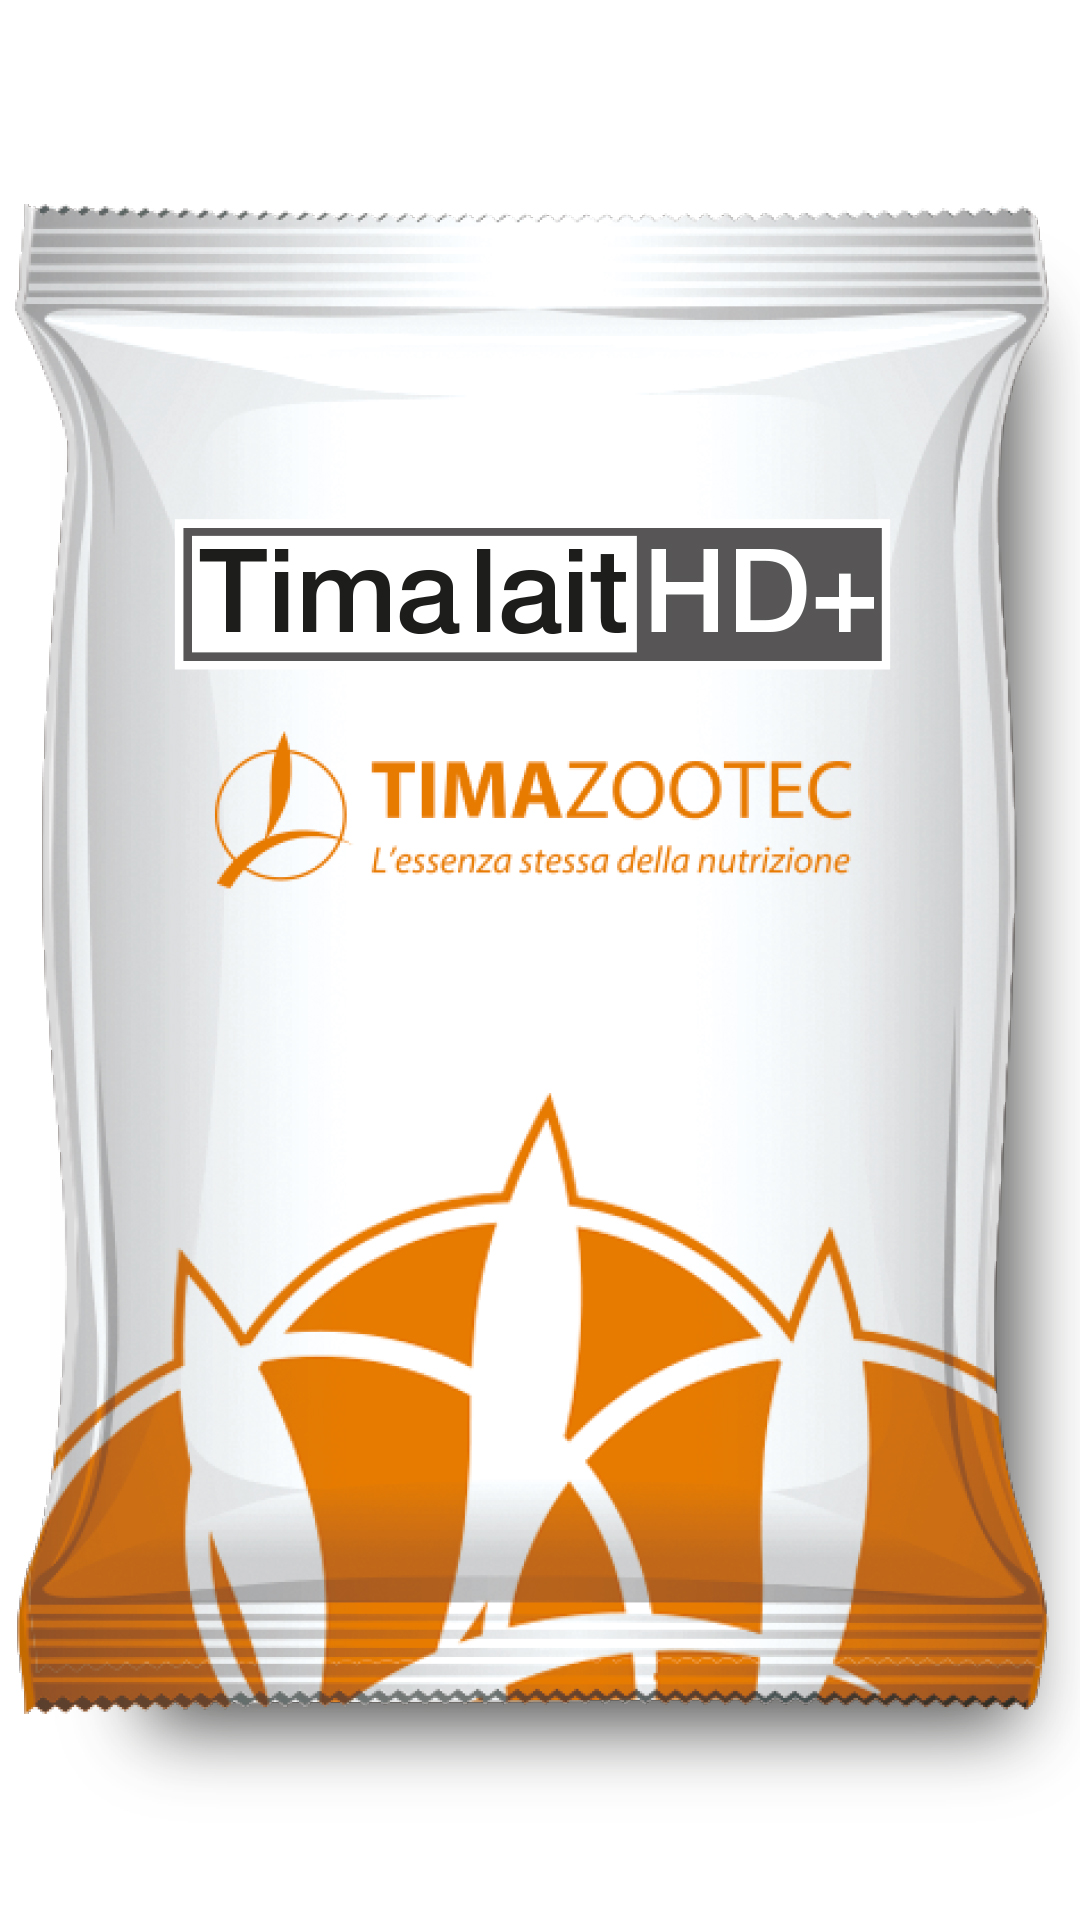 TIMALAIT HD+